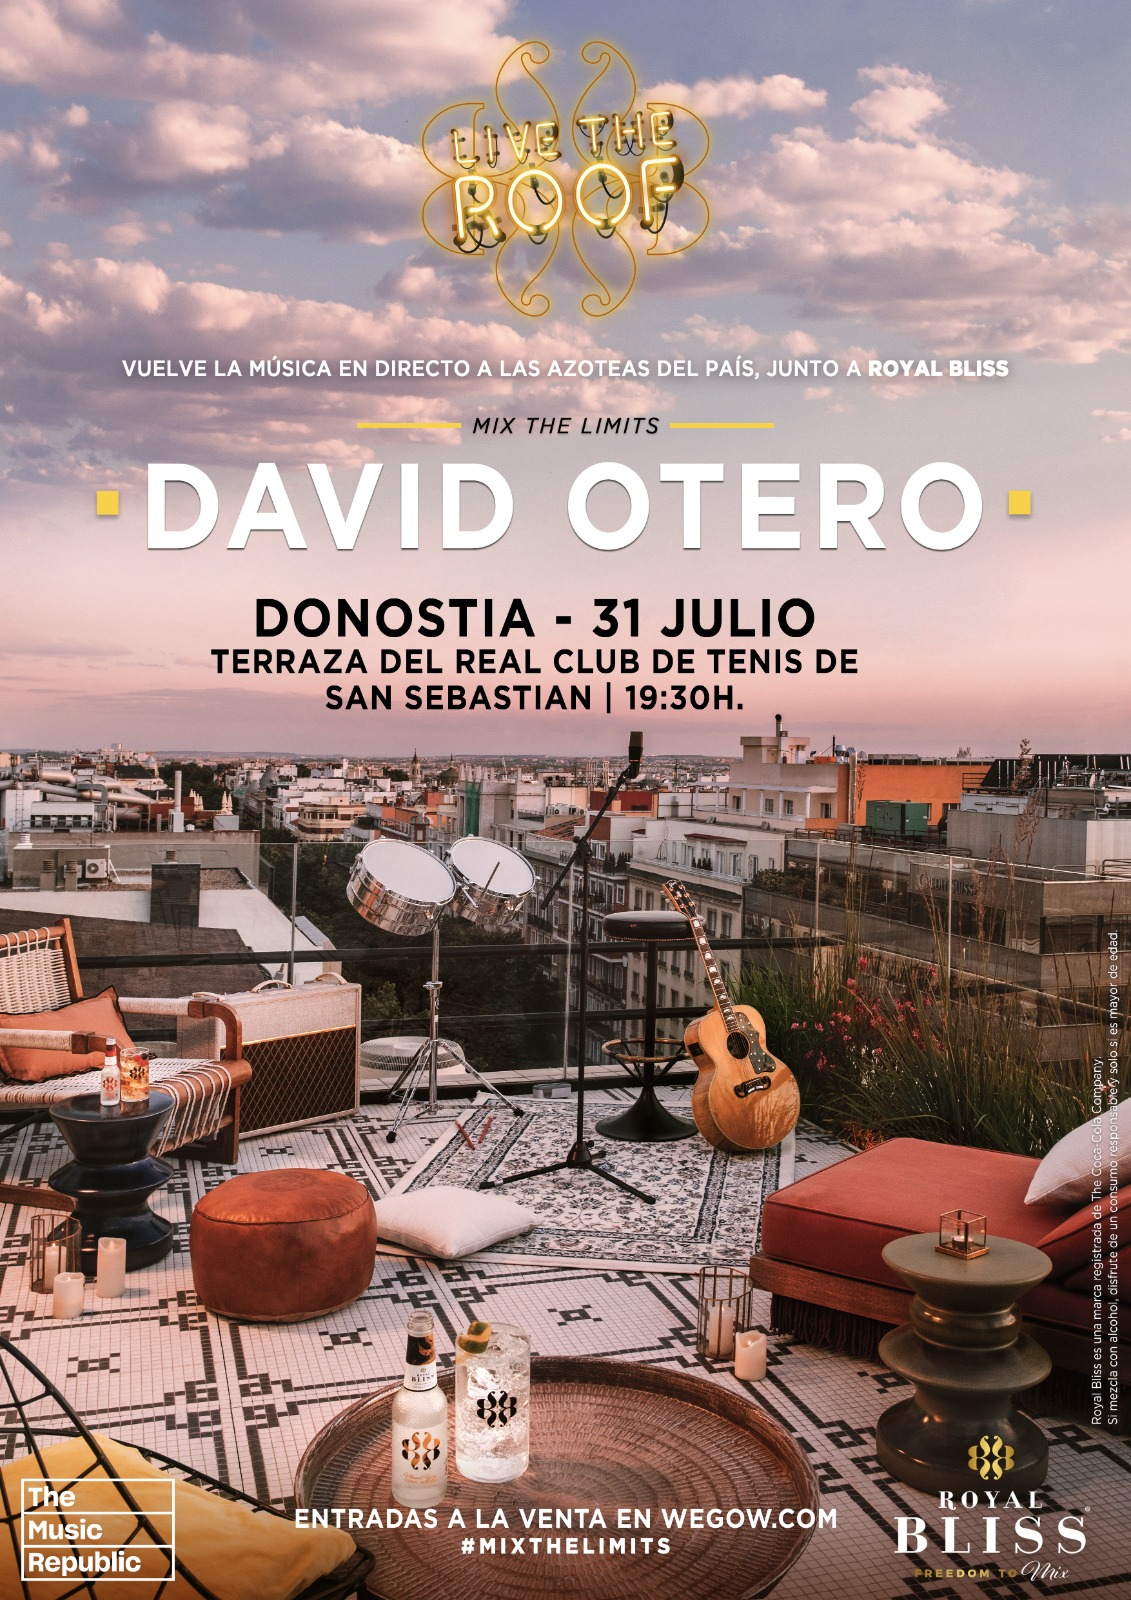 david otero en live the roof donostia 16237586025060766